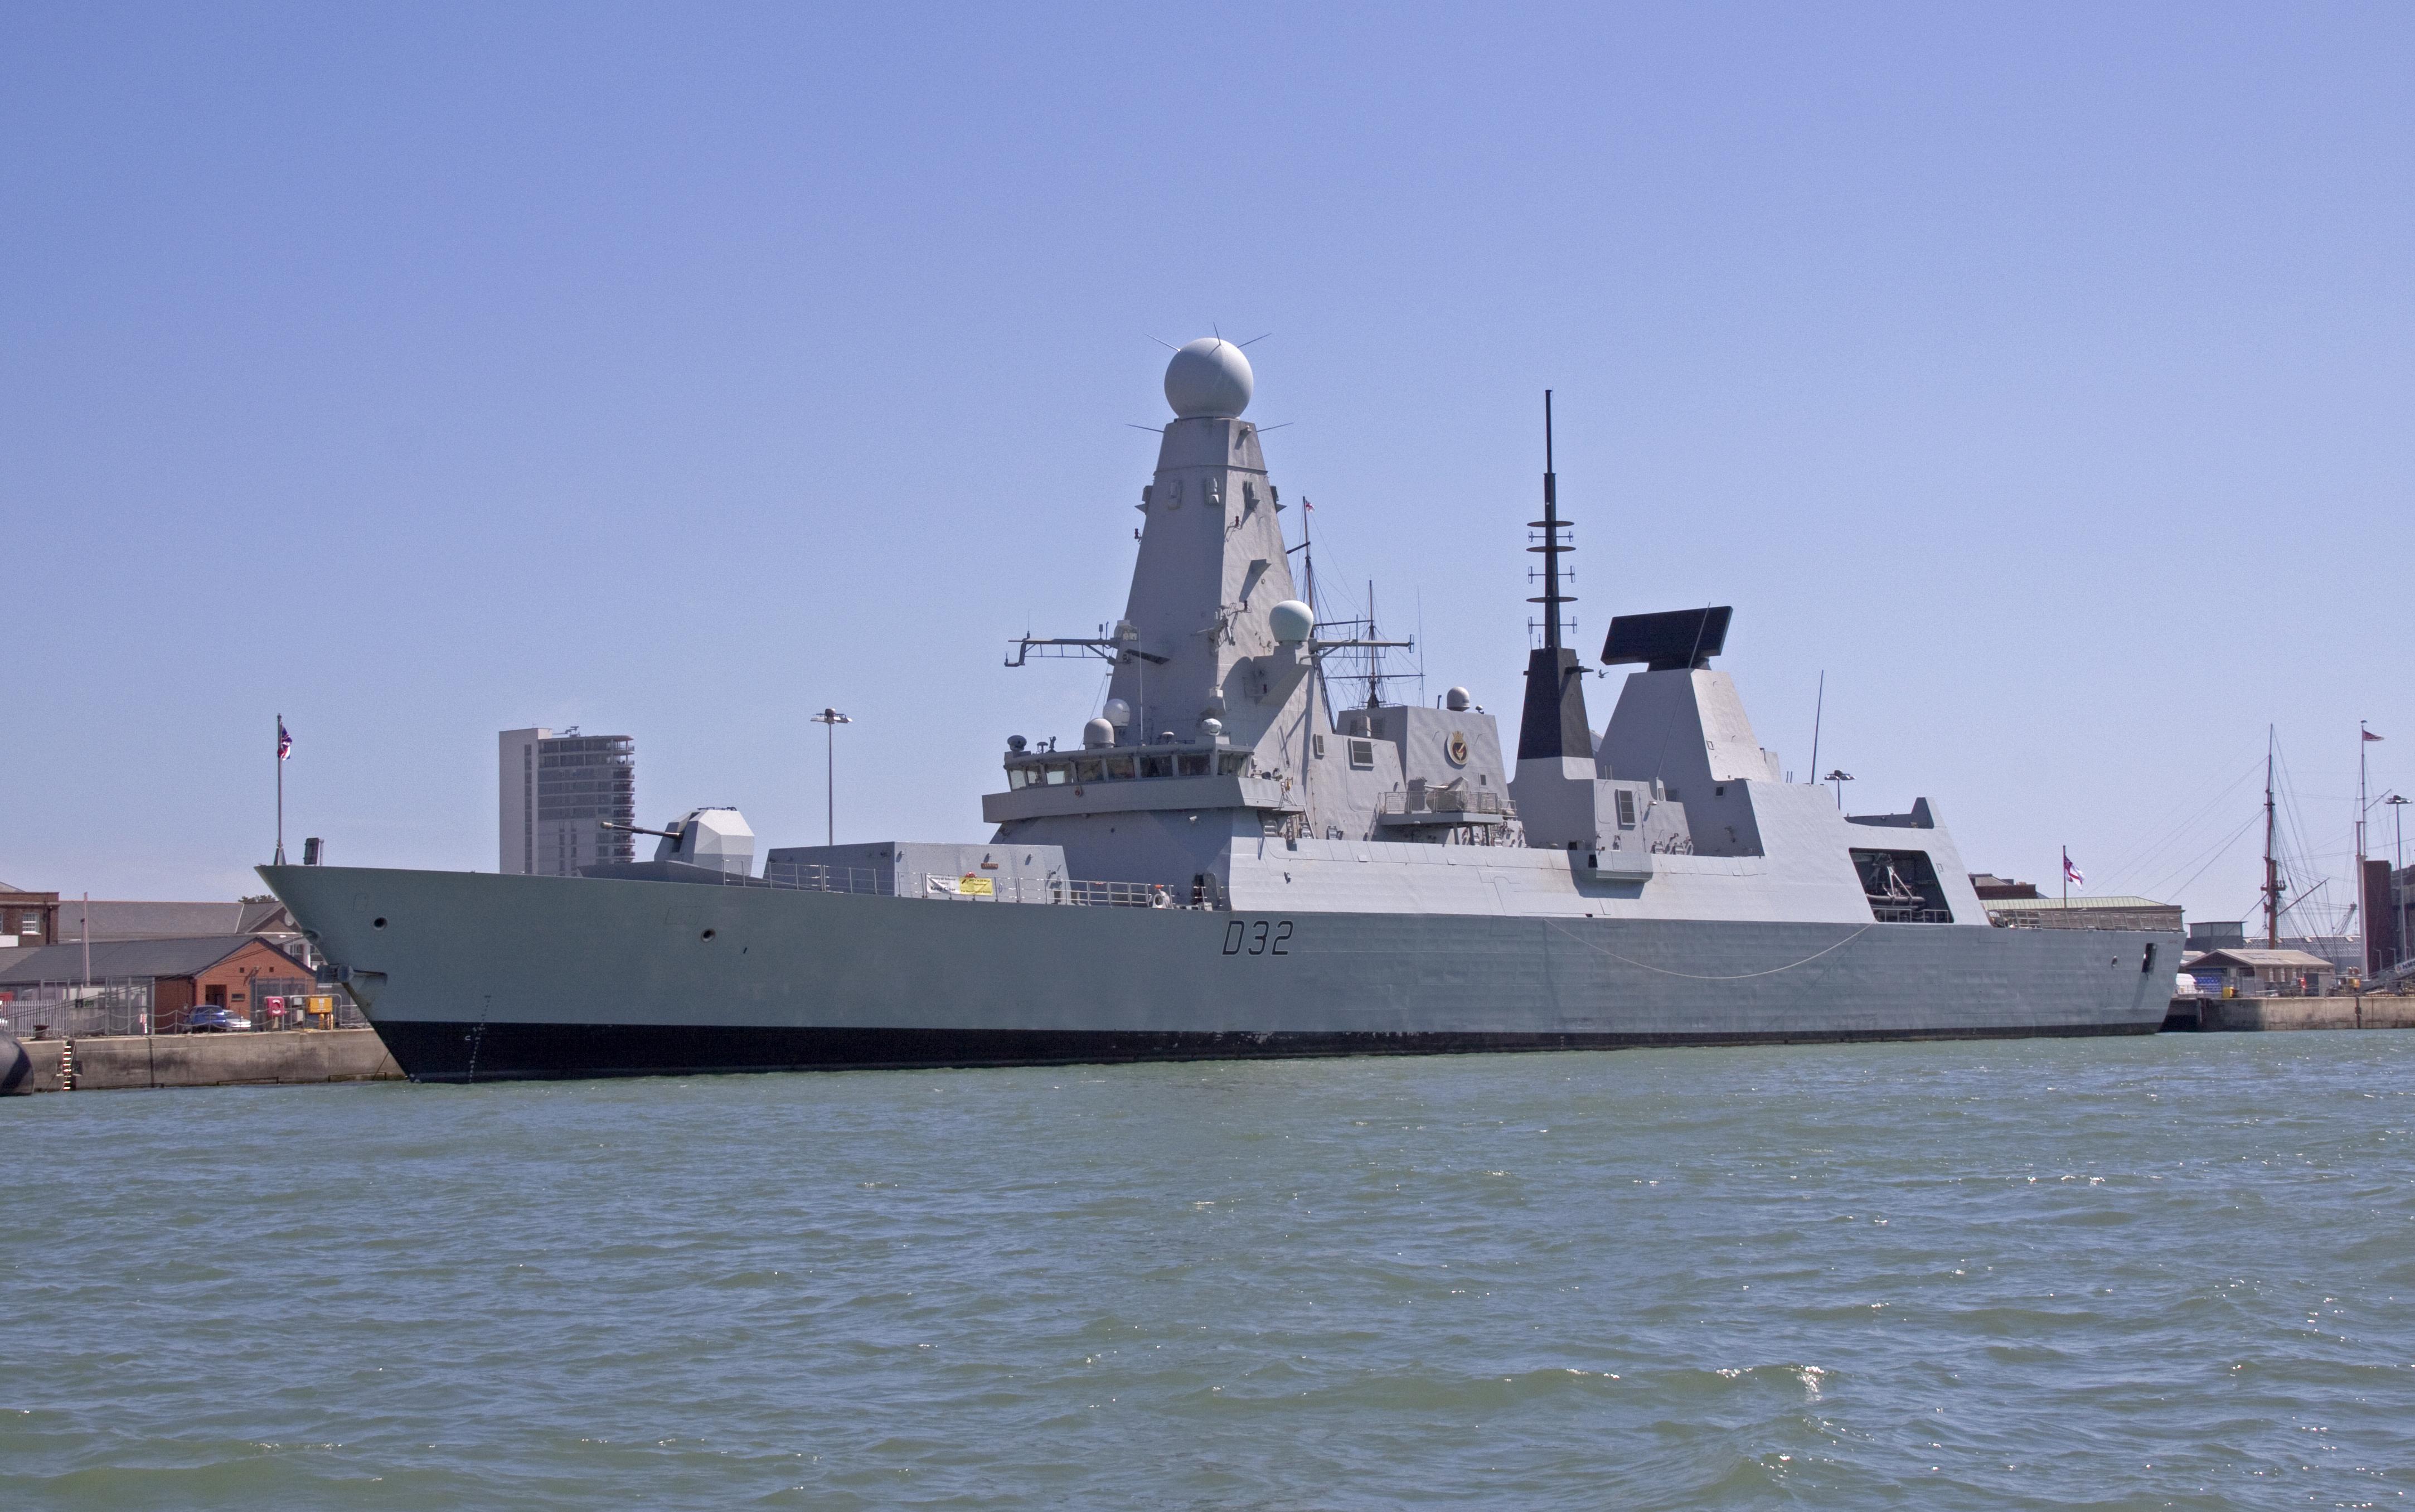 File:HMS Daring D32 (3).jpg - Wikimedia Commons